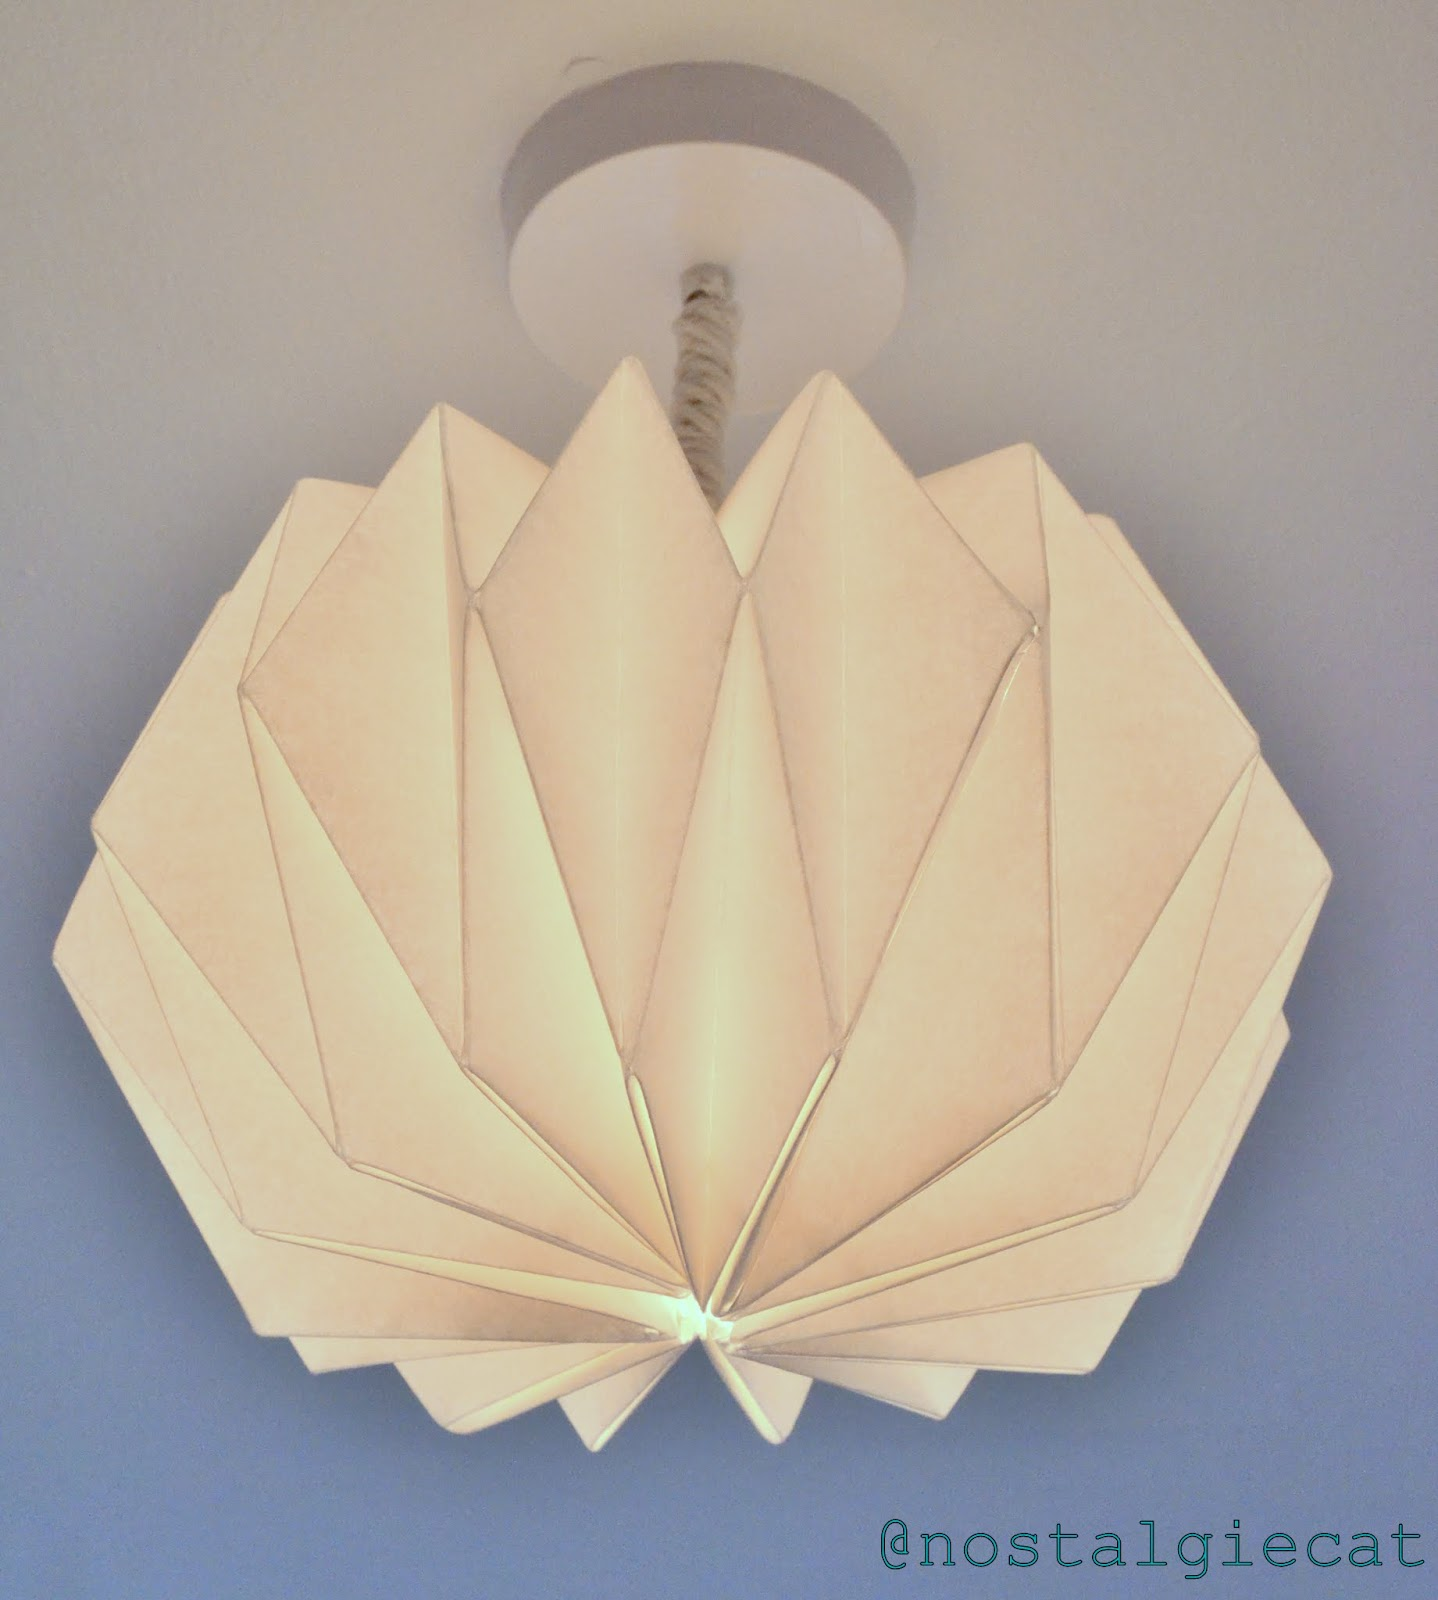 Nostalgiecat Diy Origami Paper Lampshade